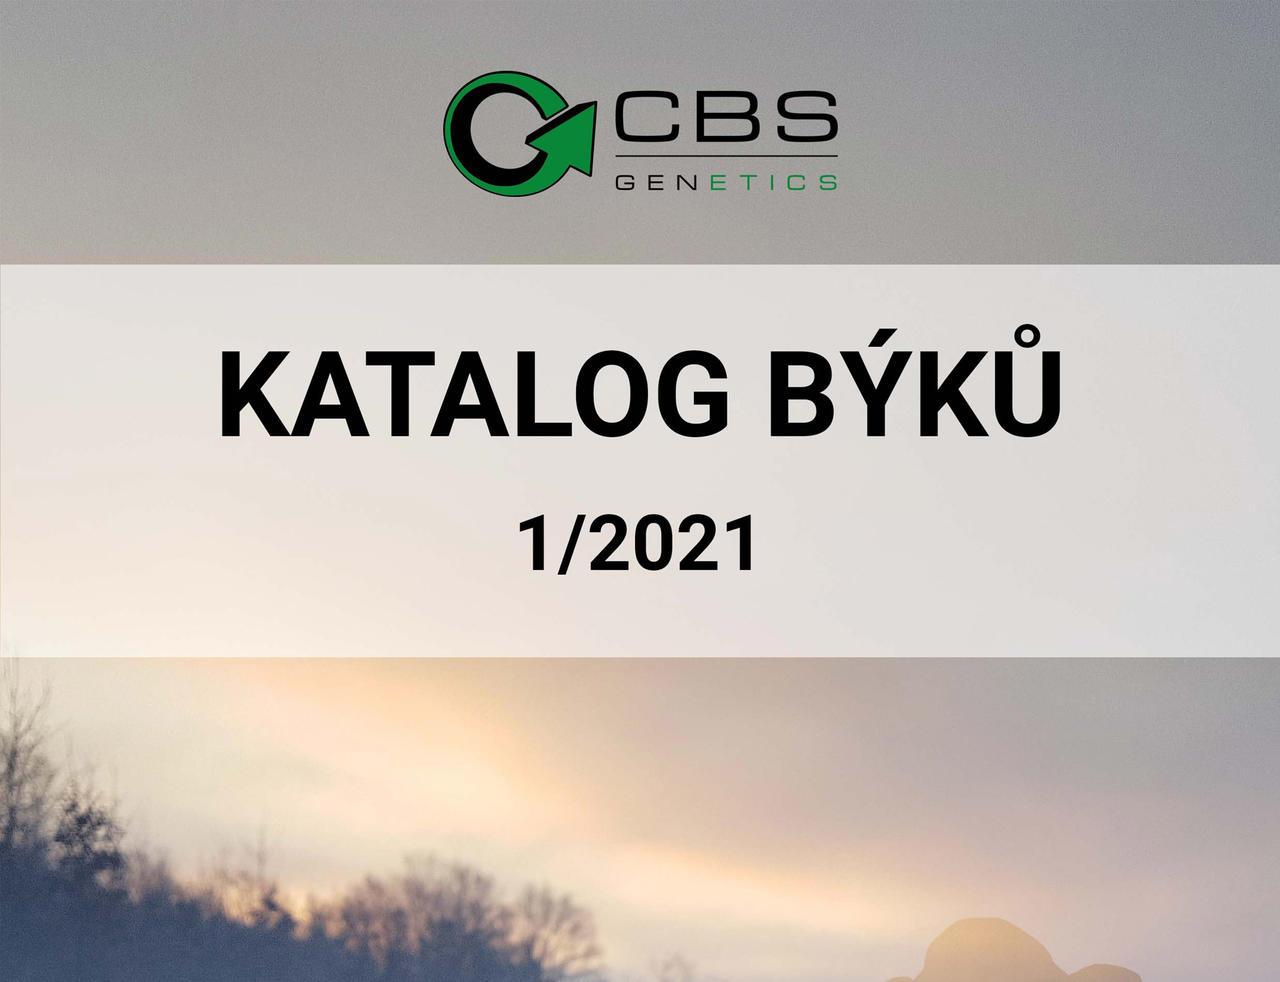 CBS katalog